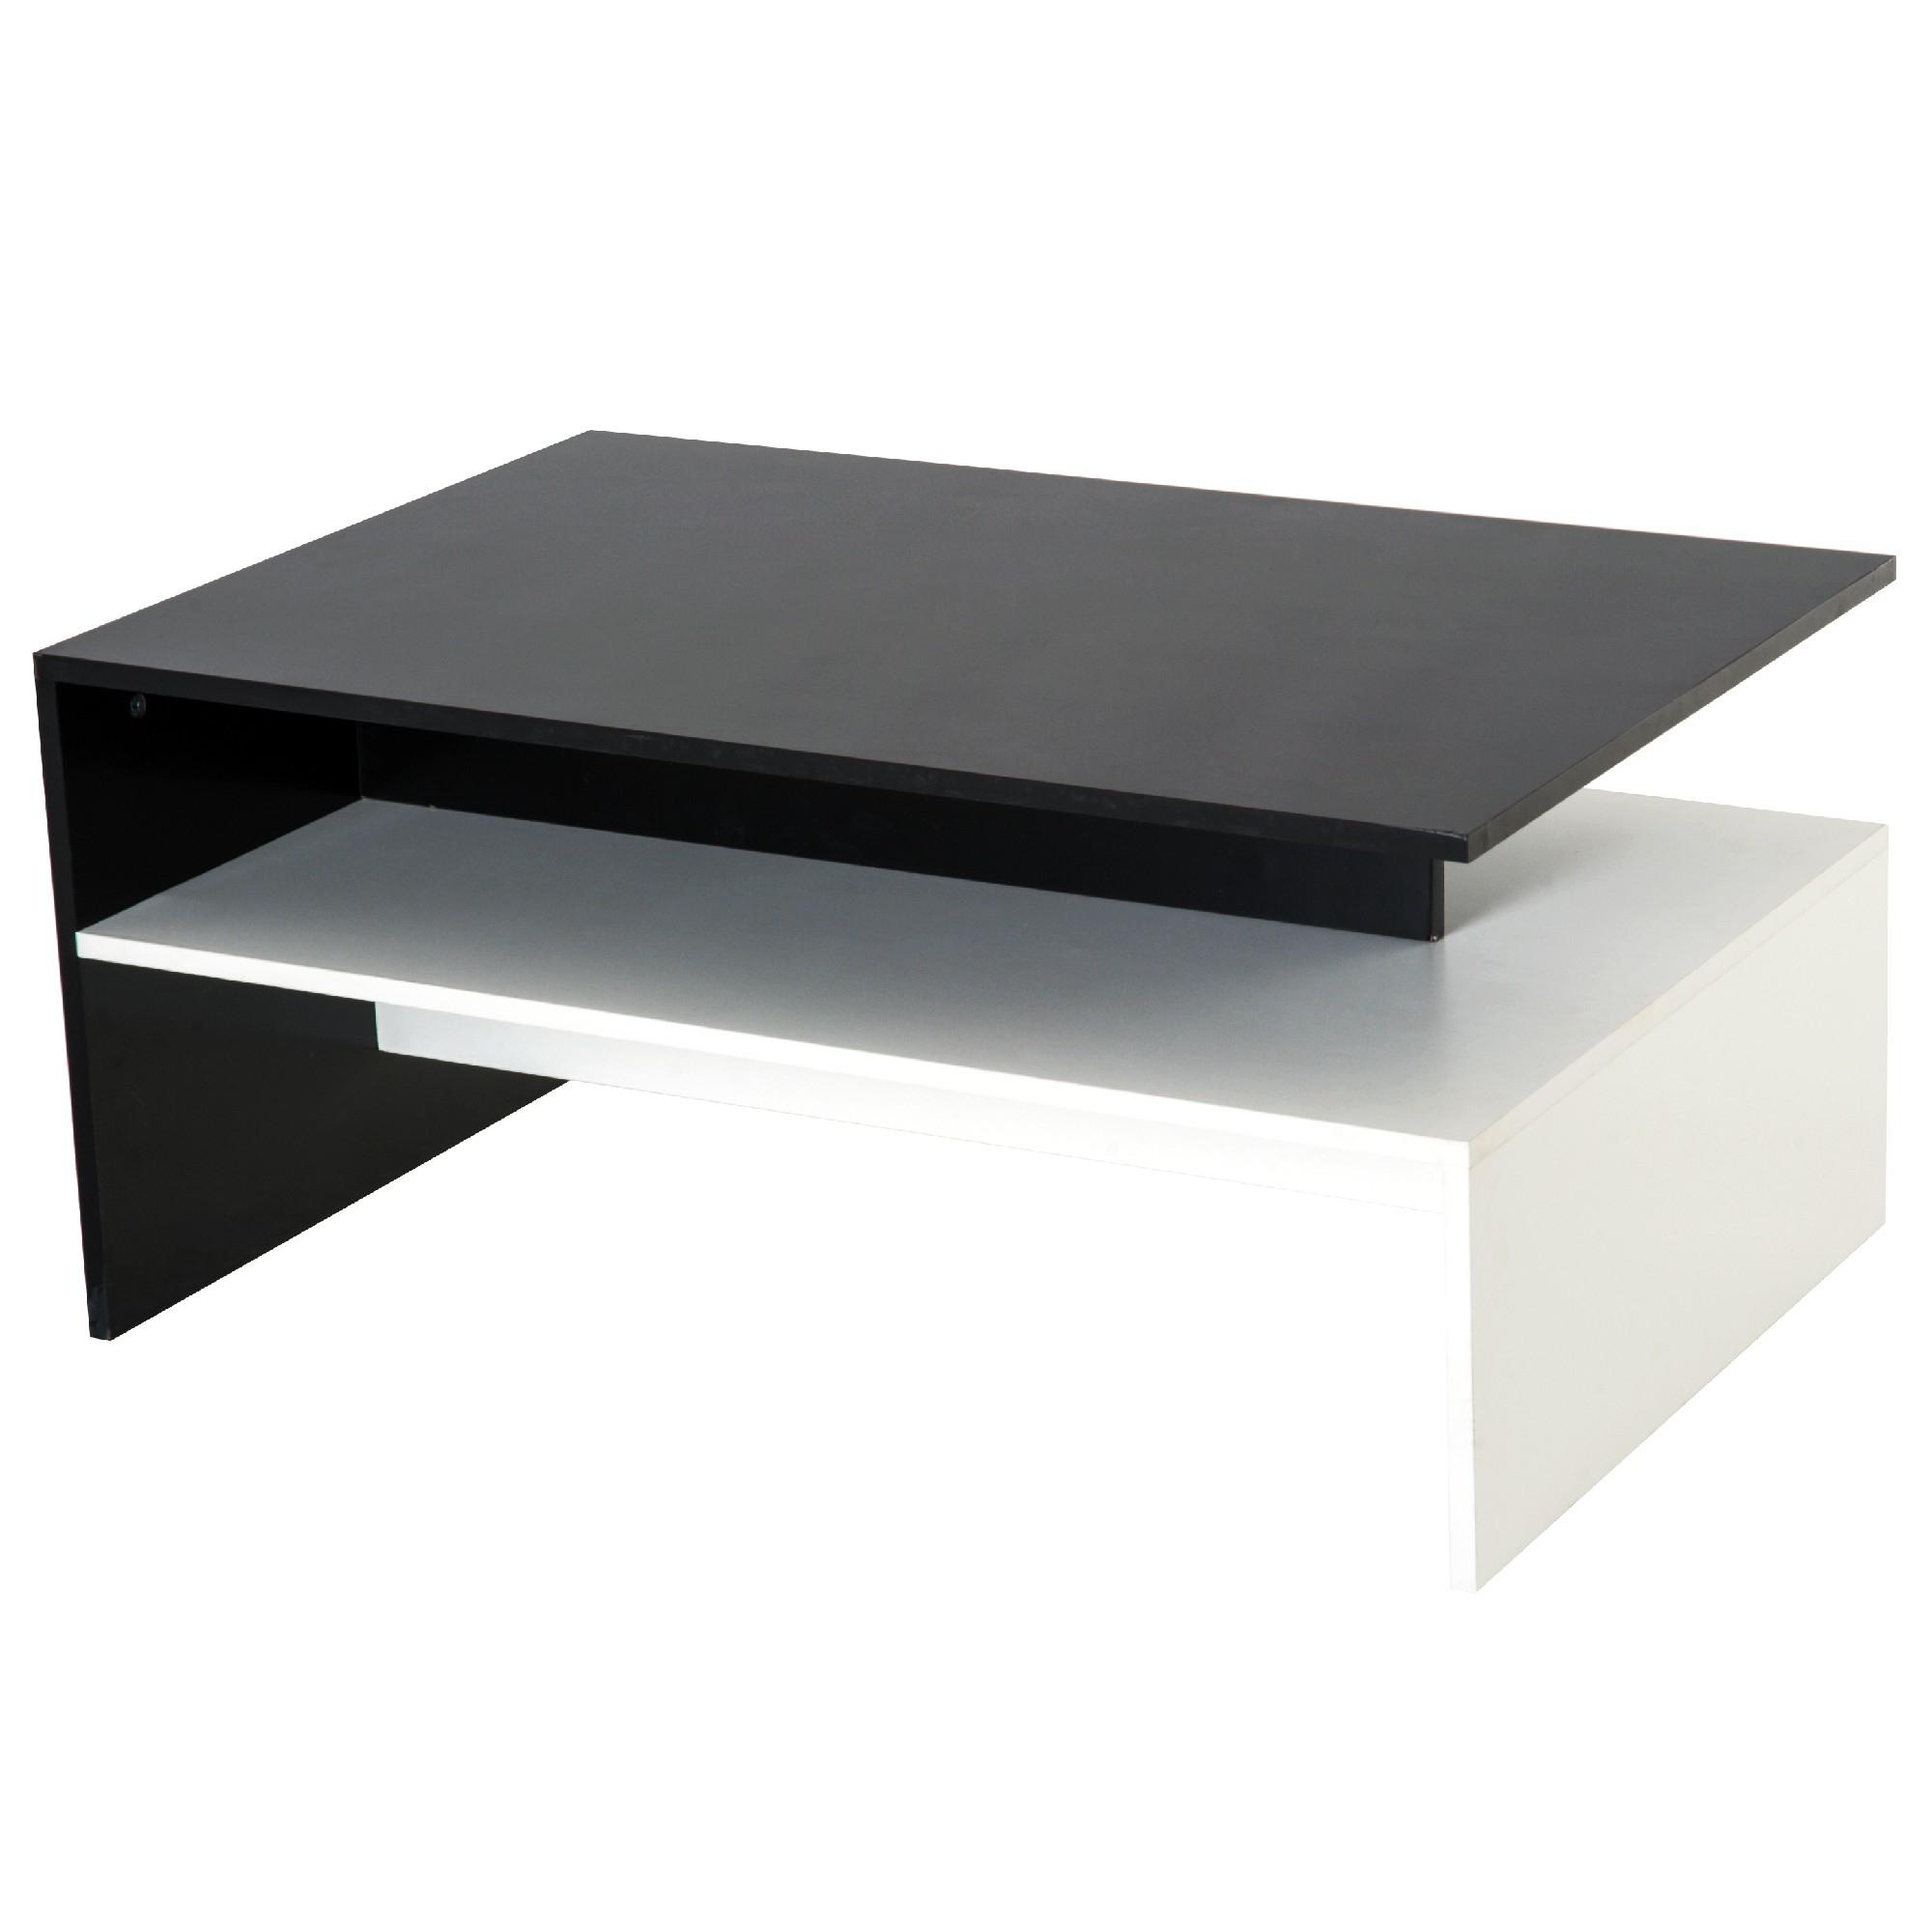 Homcom Minimalist Coffee Table Living Room W/ Storage Shelf (View 6 of 20)